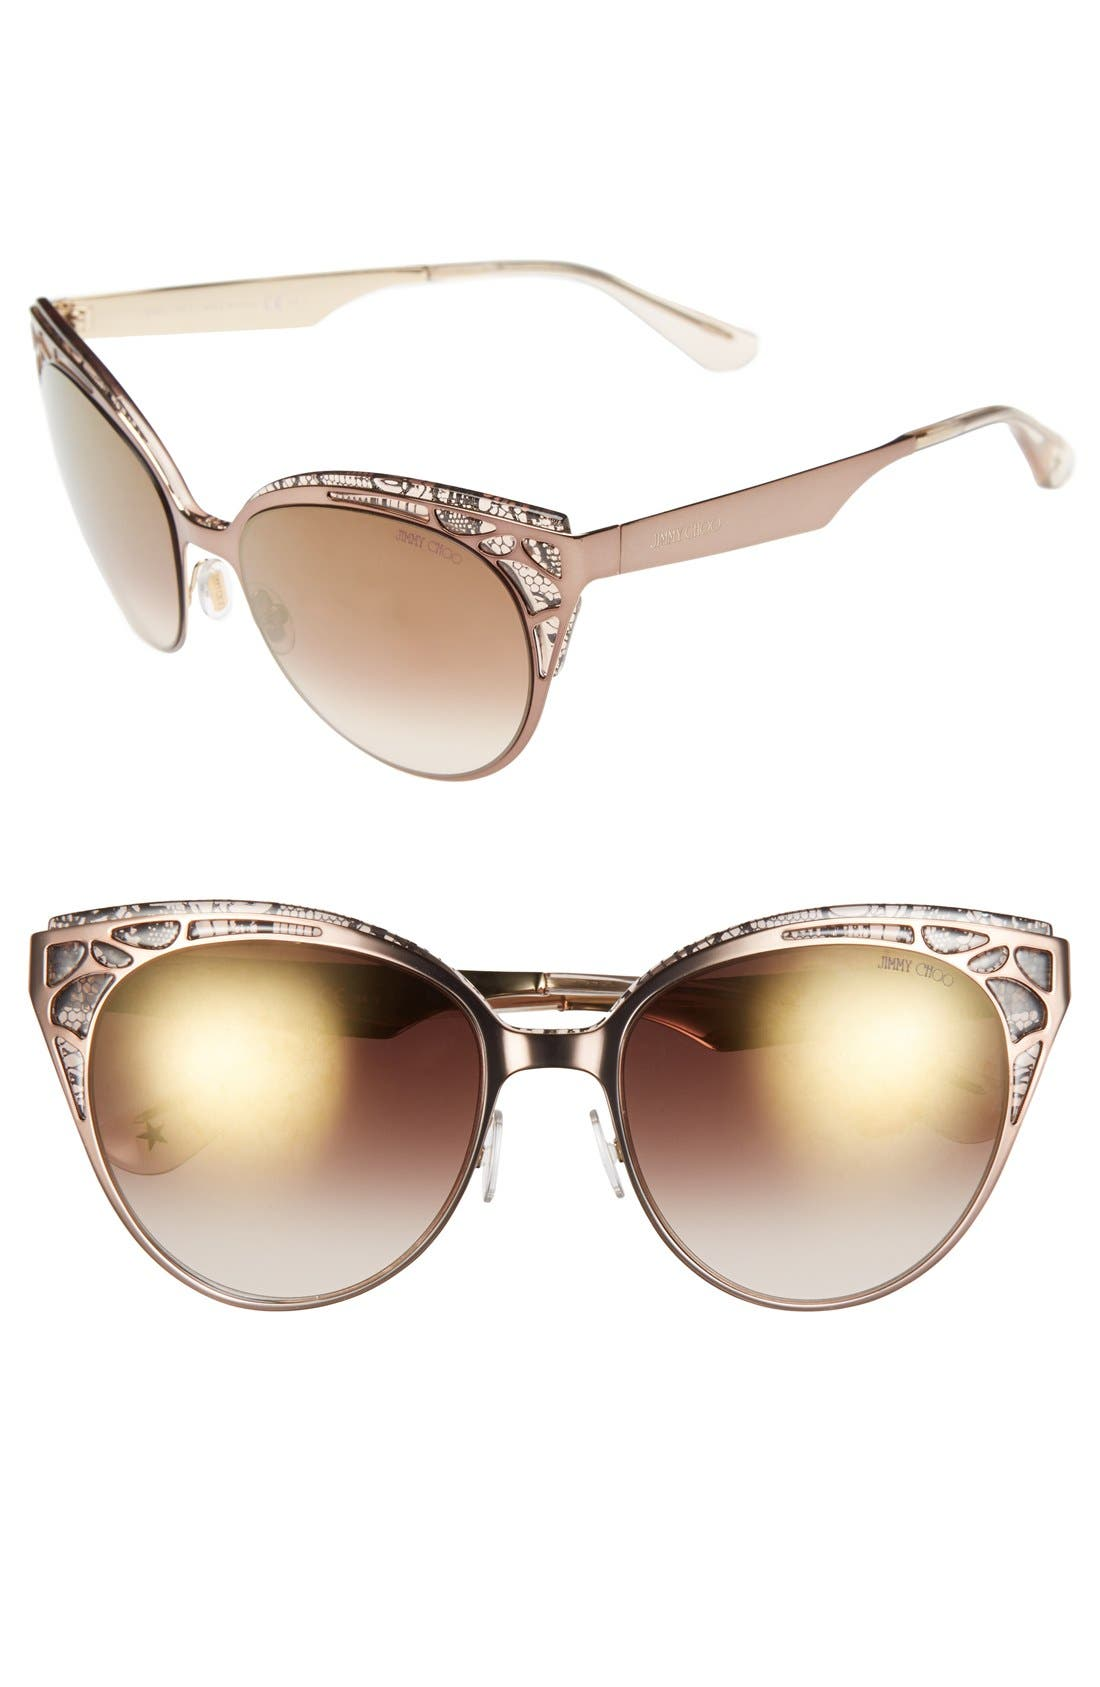 Alternate Image 1 Selected - Jimmy Choo 'Estelle' Metal Cat Eye Crystal Lace 55mm Sunglasses